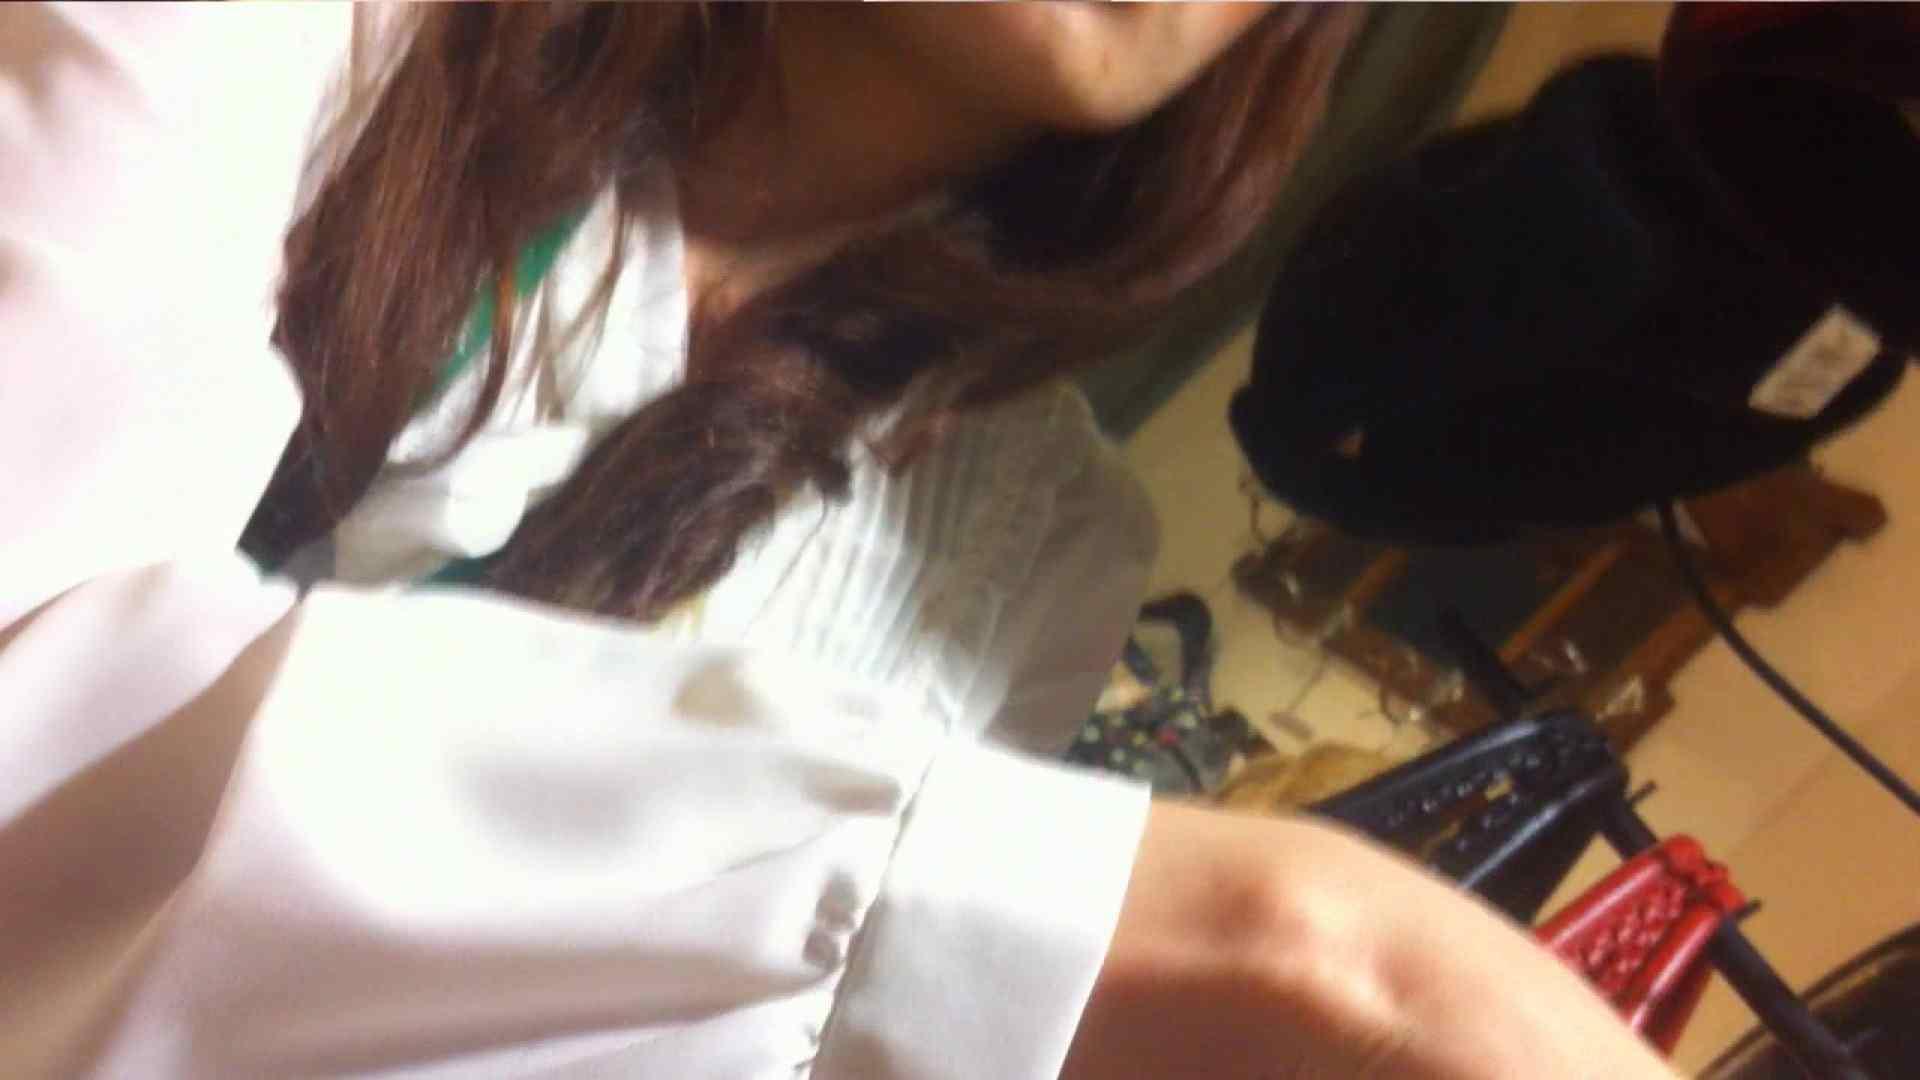 vol.34 美人アパレル胸チラ&パンチラ メガネ属性っていいよね♥ パンチラ 戯れ無修正画像 88PIX 82